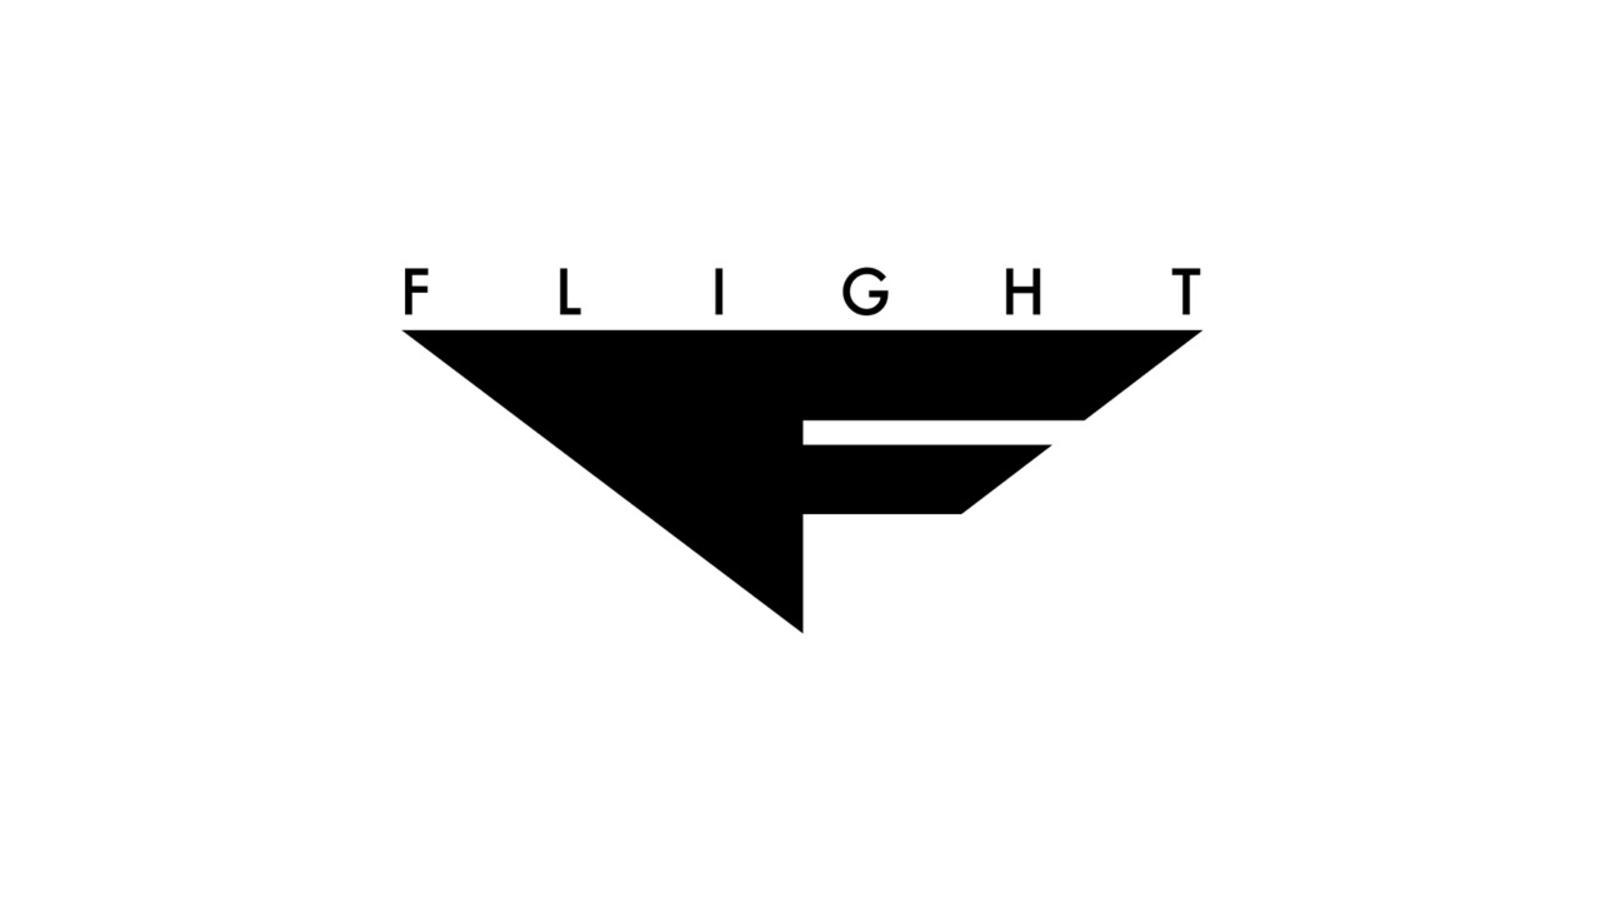 d4f891393e90 nike-air-maestro-flight-1-logo.  sp14 bb hyperrev 630913 003 blk metsil 3qtr lat toe.  sp14 bb hyperrev 630913 003 blk metsil lat